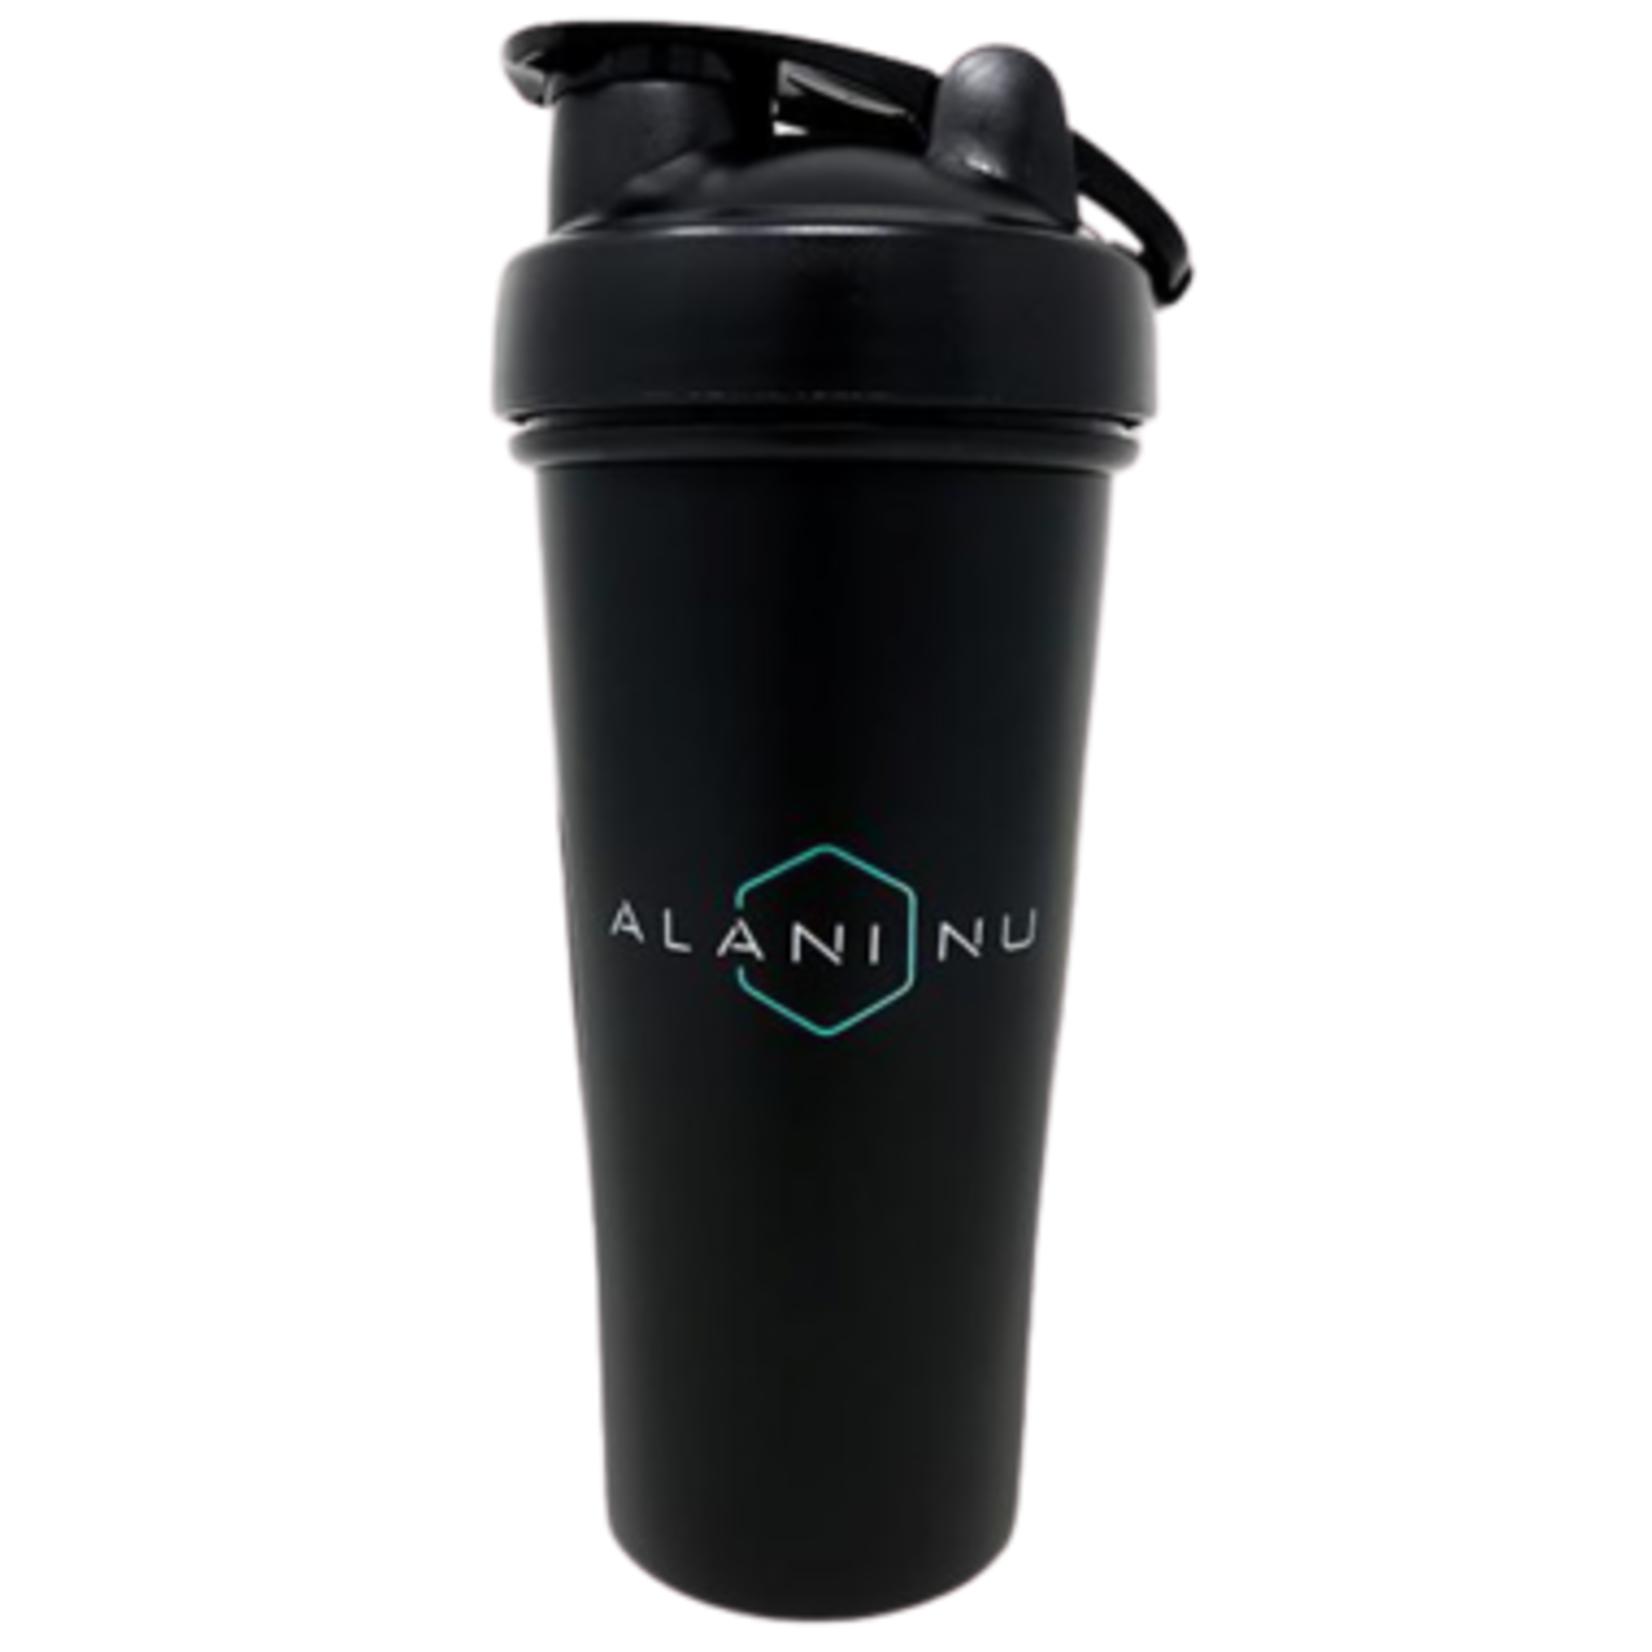 Alani Nu Alani Nu Shaker Bottle Black